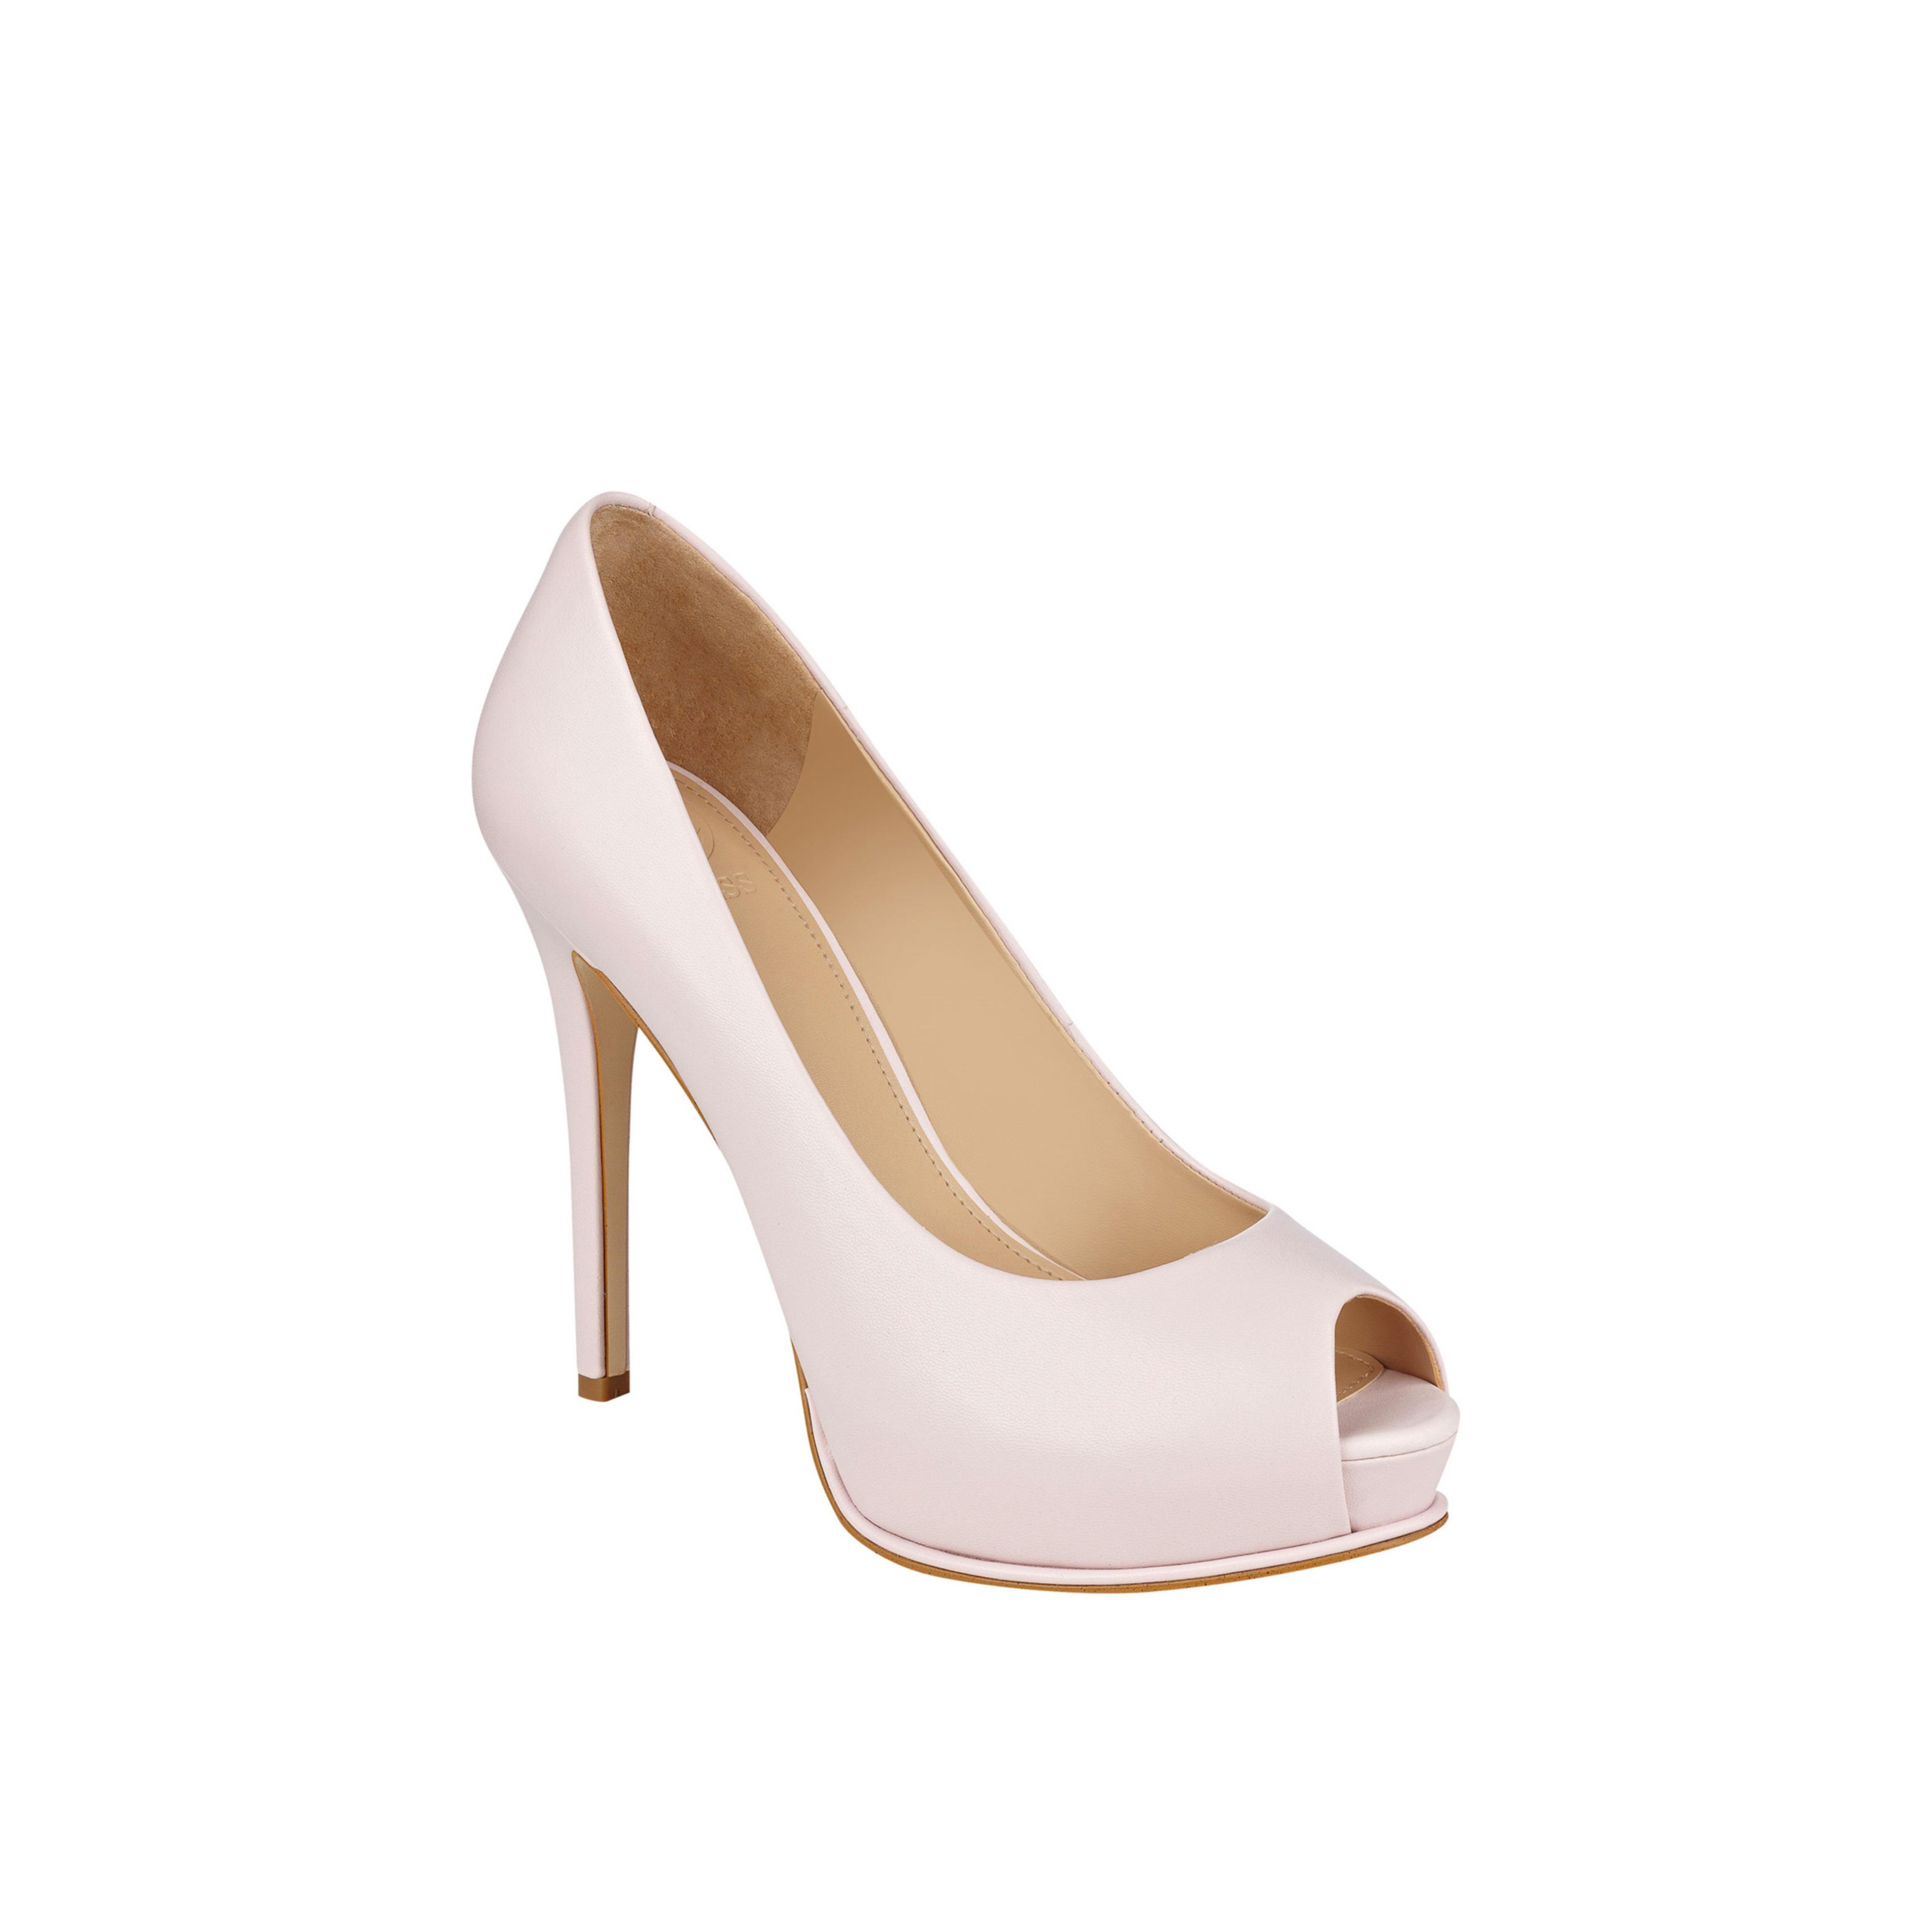 Guess. Women's Pink Honora Peep-toe Platform Pumps